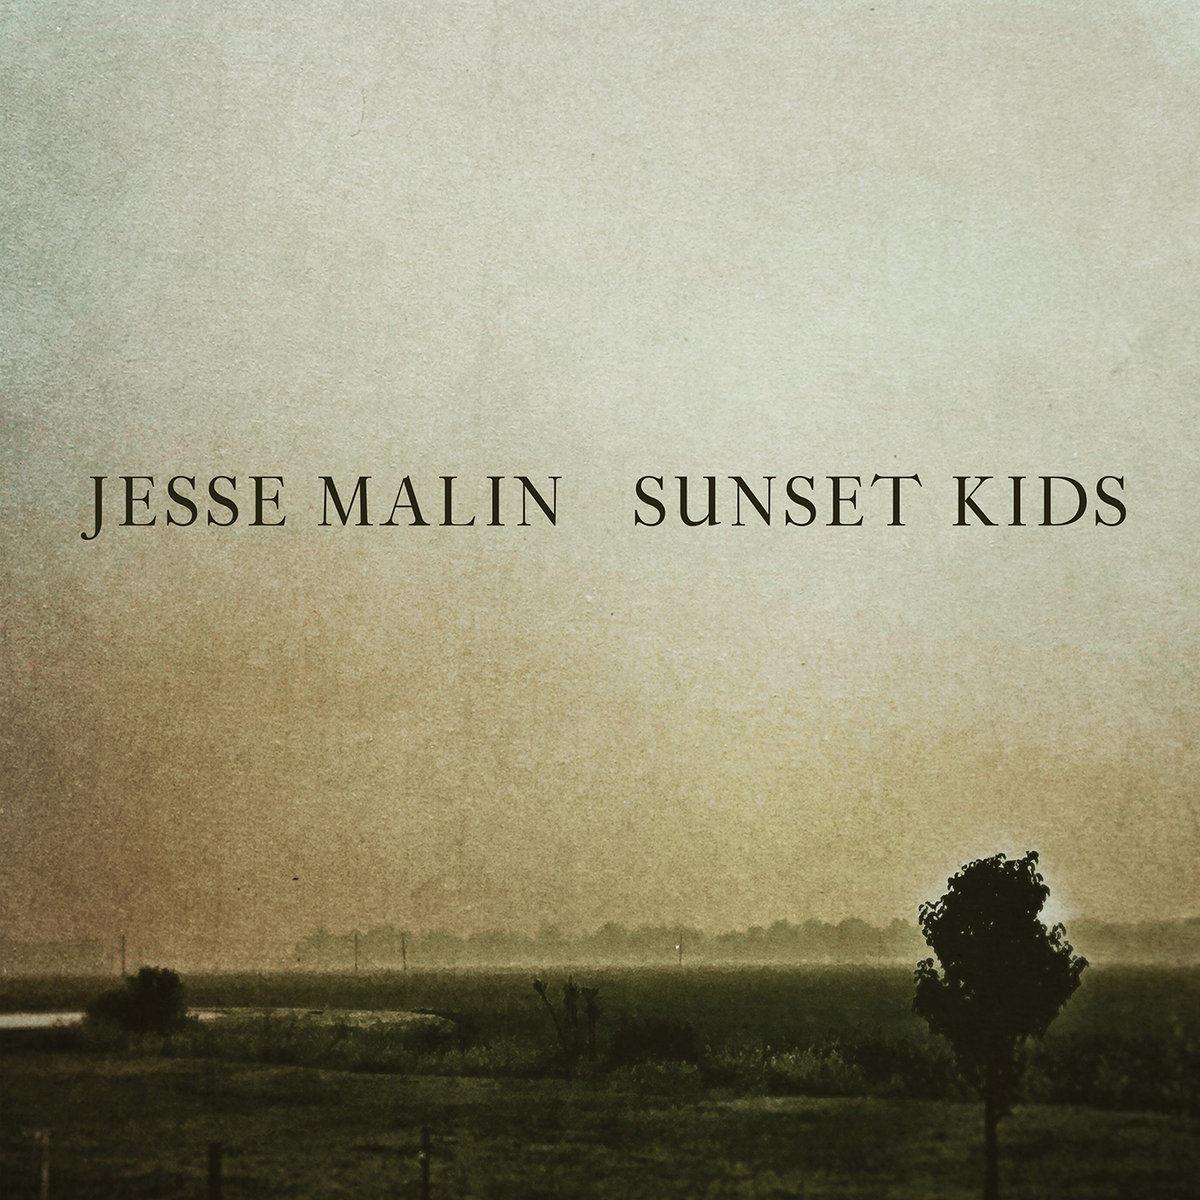 Jesse Malin – Sunset Kids